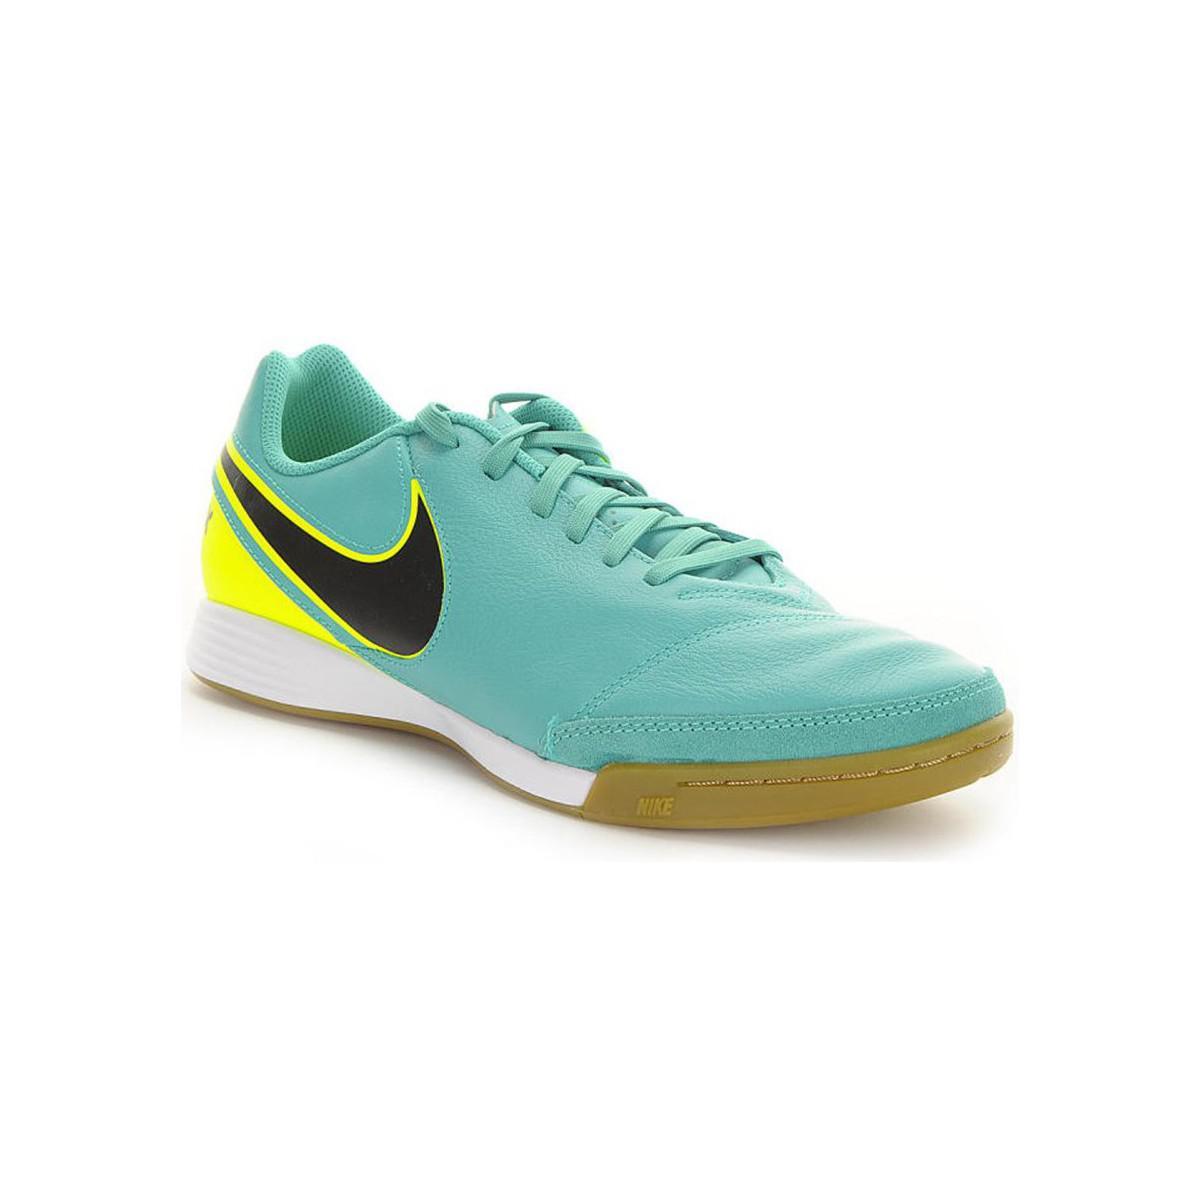 b5efb8c4803b Nike Tiempox Genio Ii Leather Ic Men s Football Boots In Green in ...